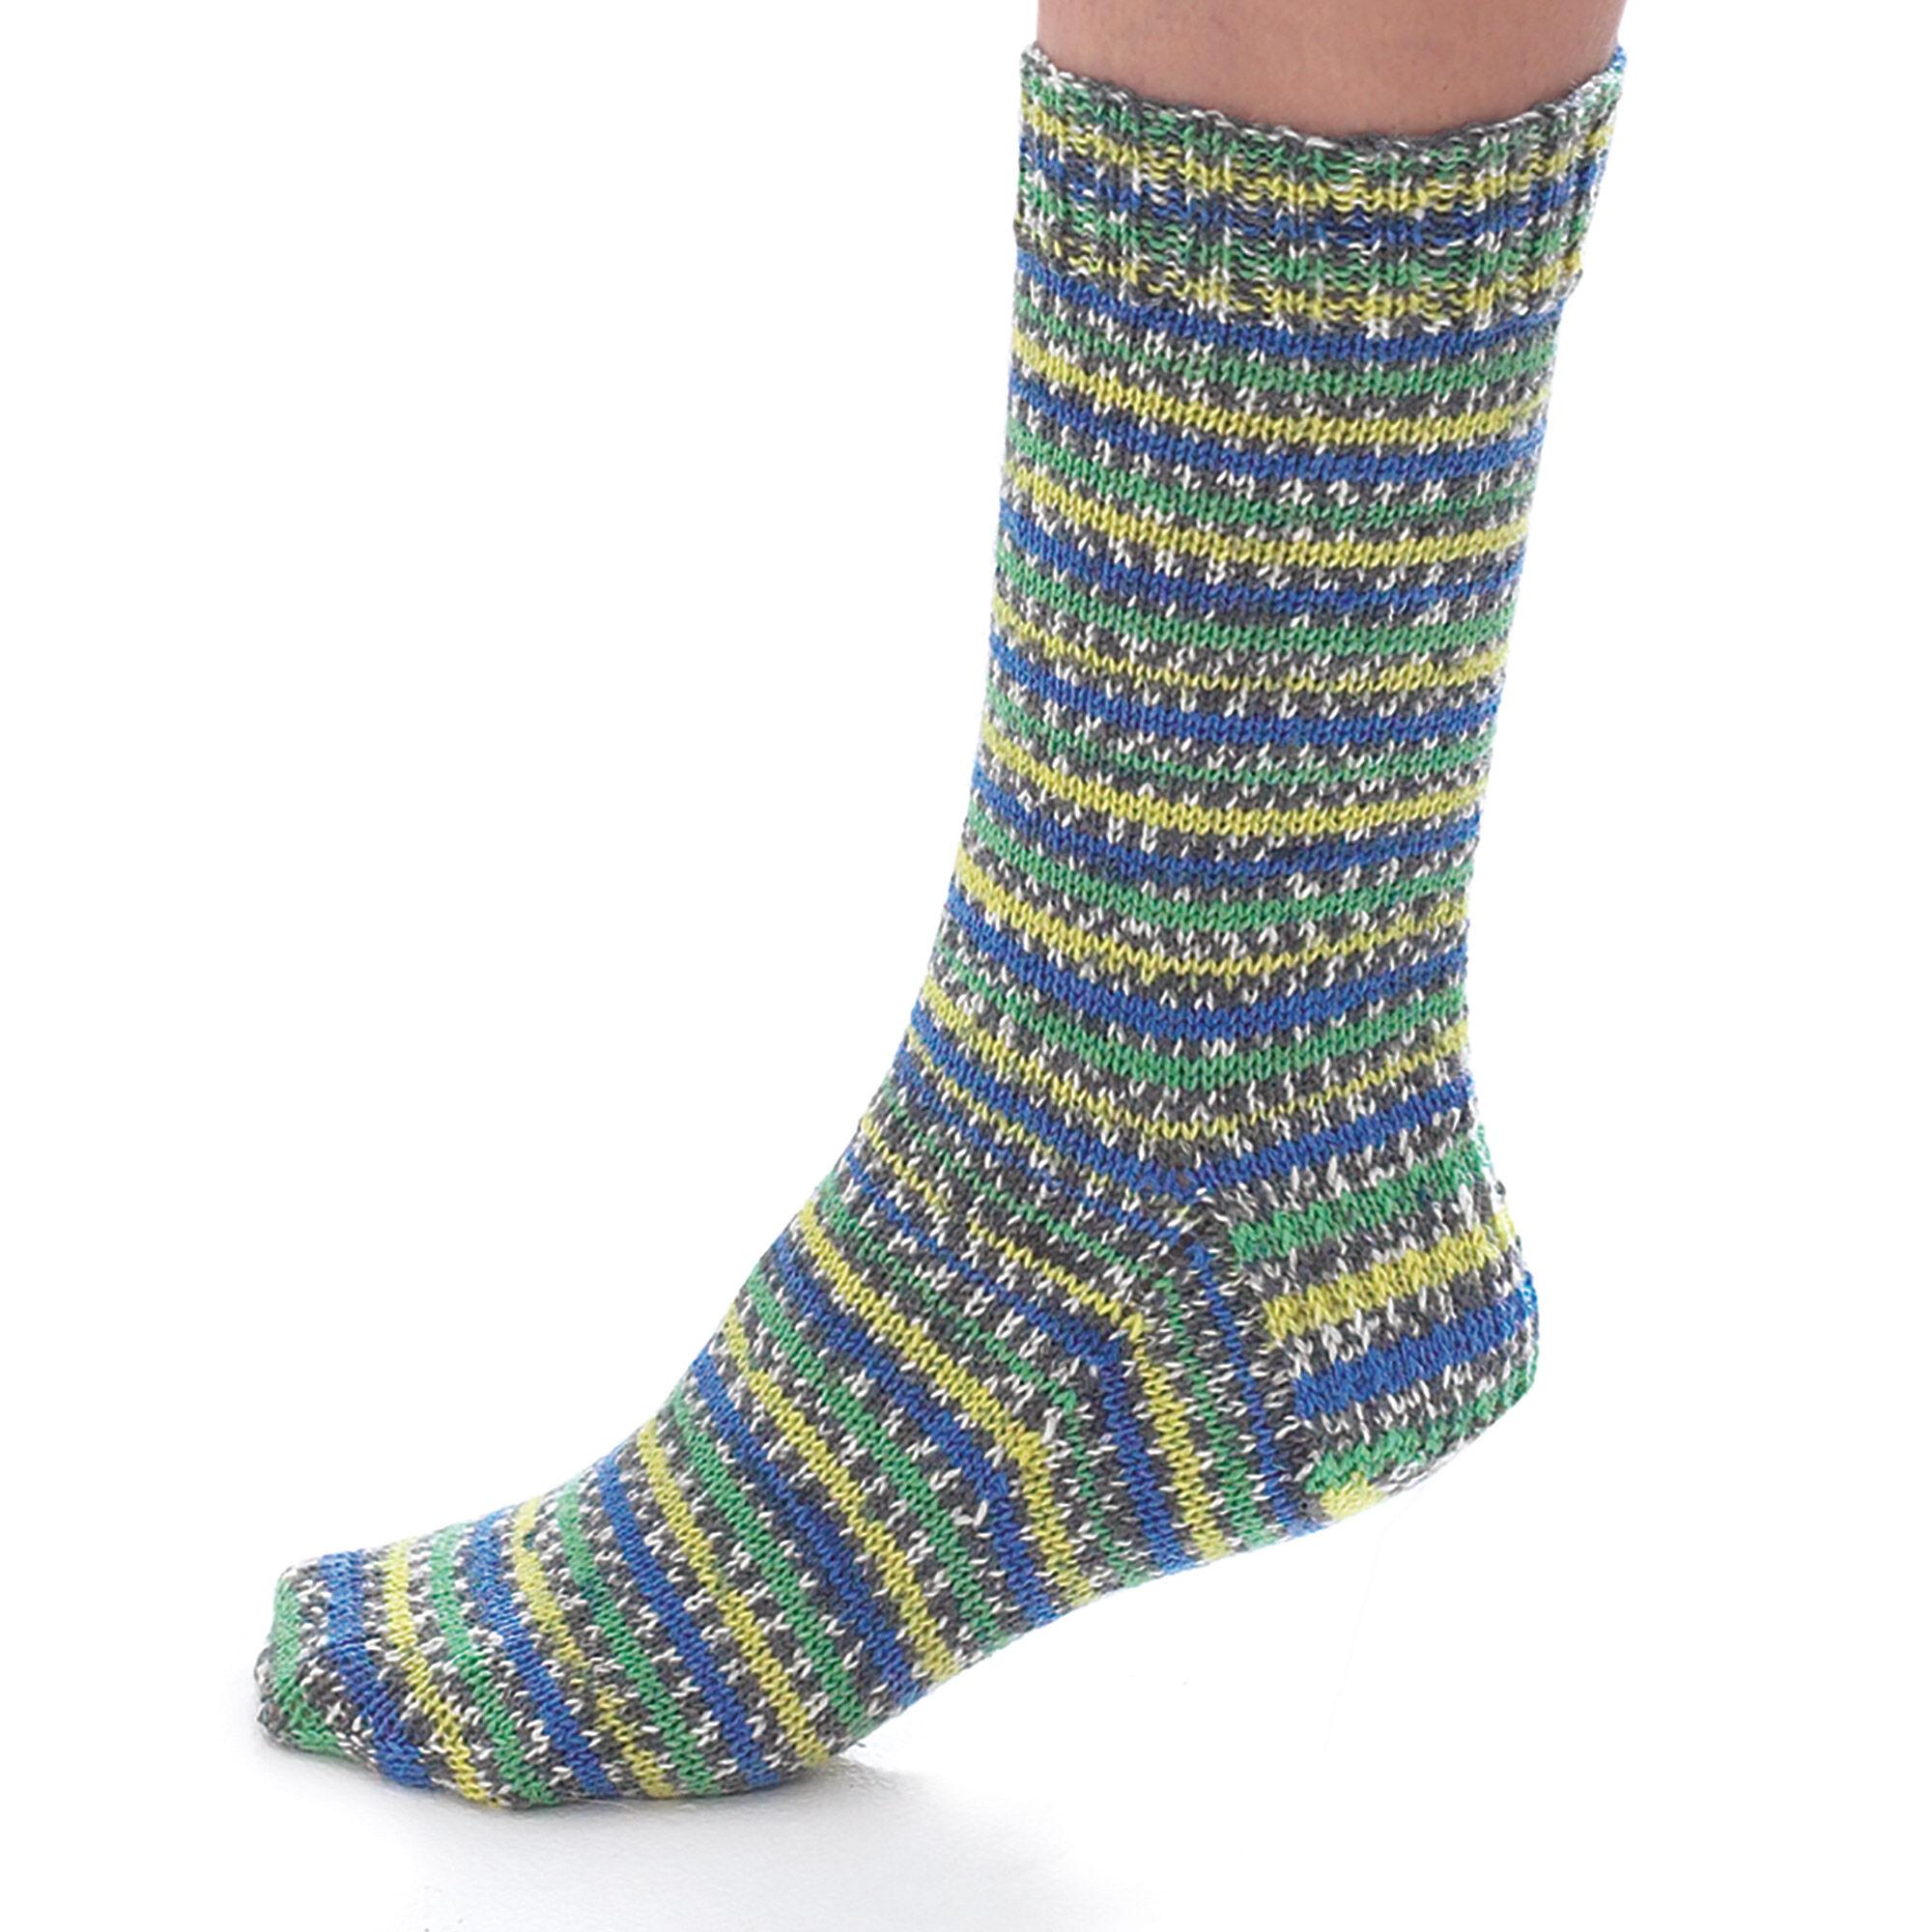 Patons Jacquard & Stripe Socks, S   Yarnspirations